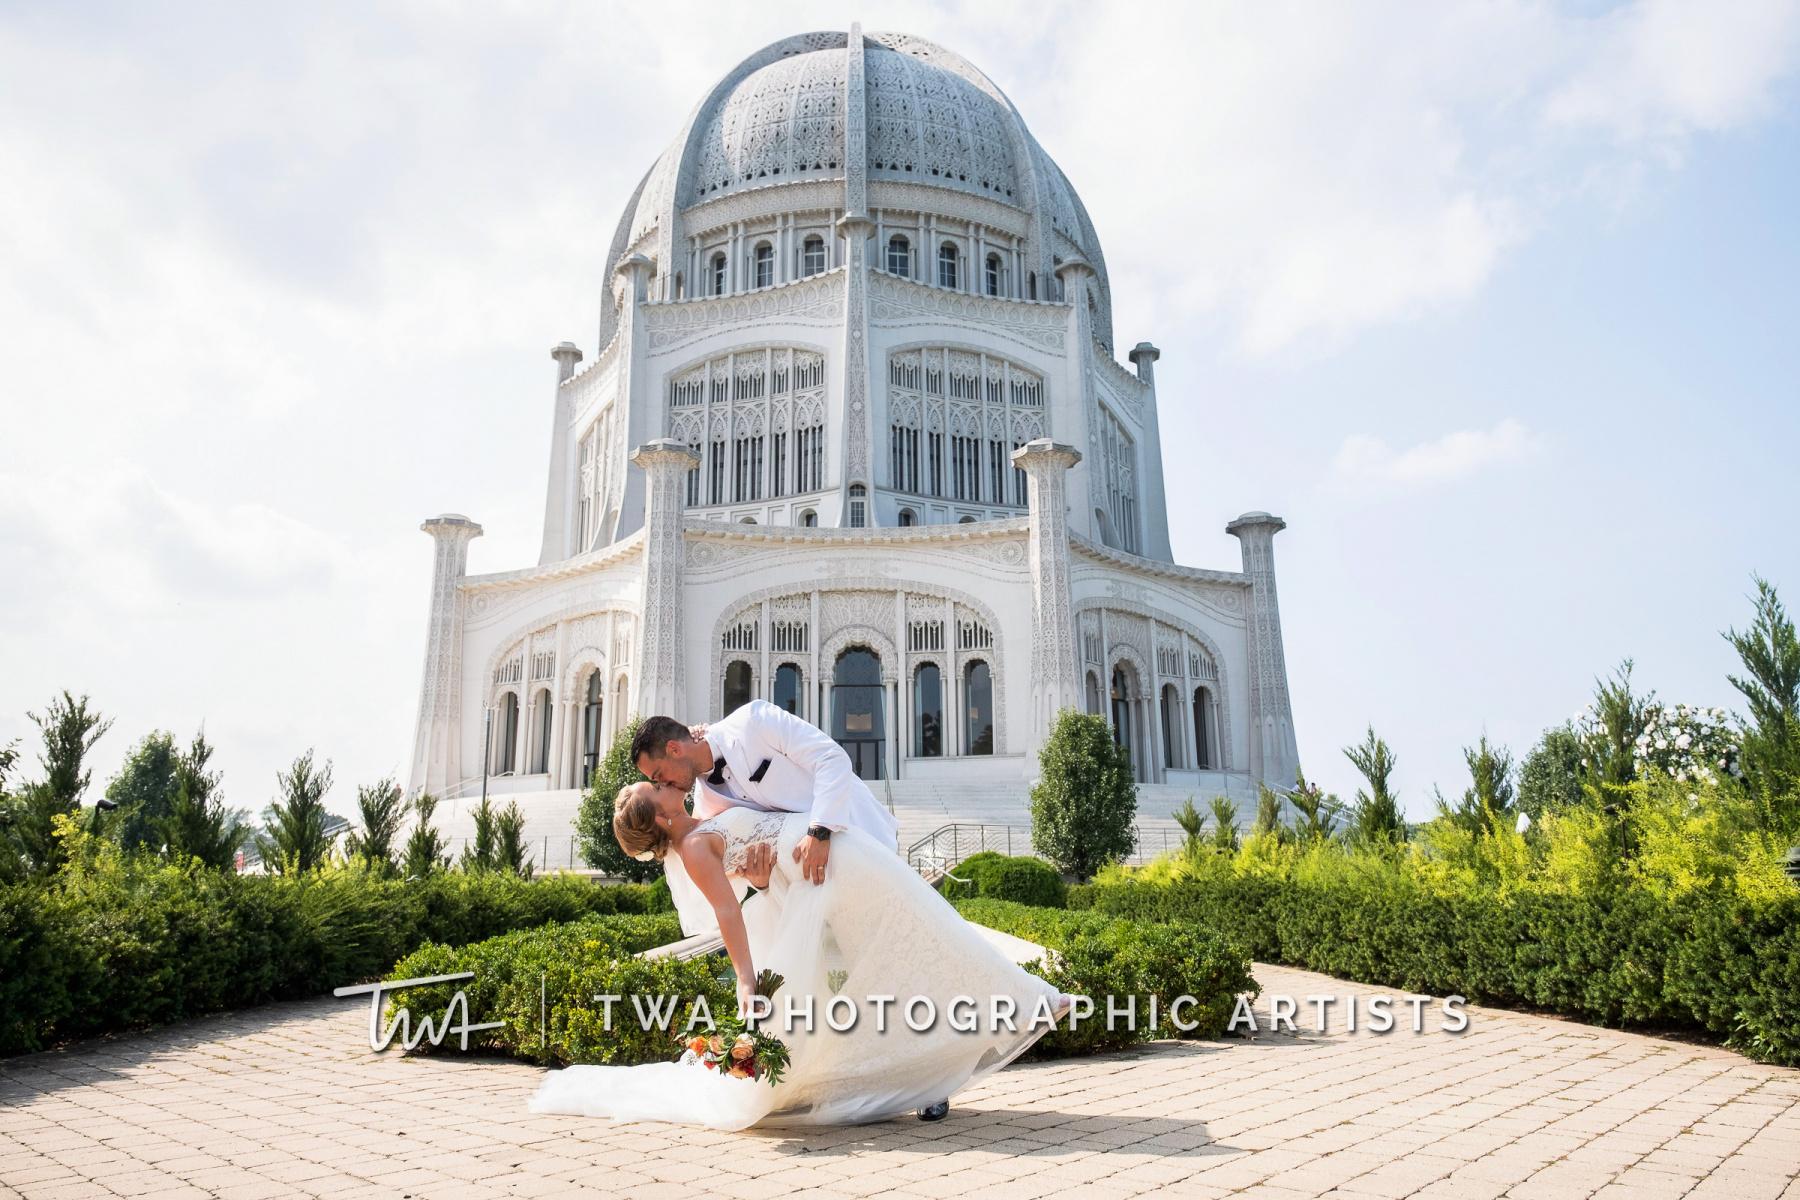 Chicago-Wedding-Photographers-Renaissance-Hotel_Hohensee_Fleishman_JG_DK-045-0325